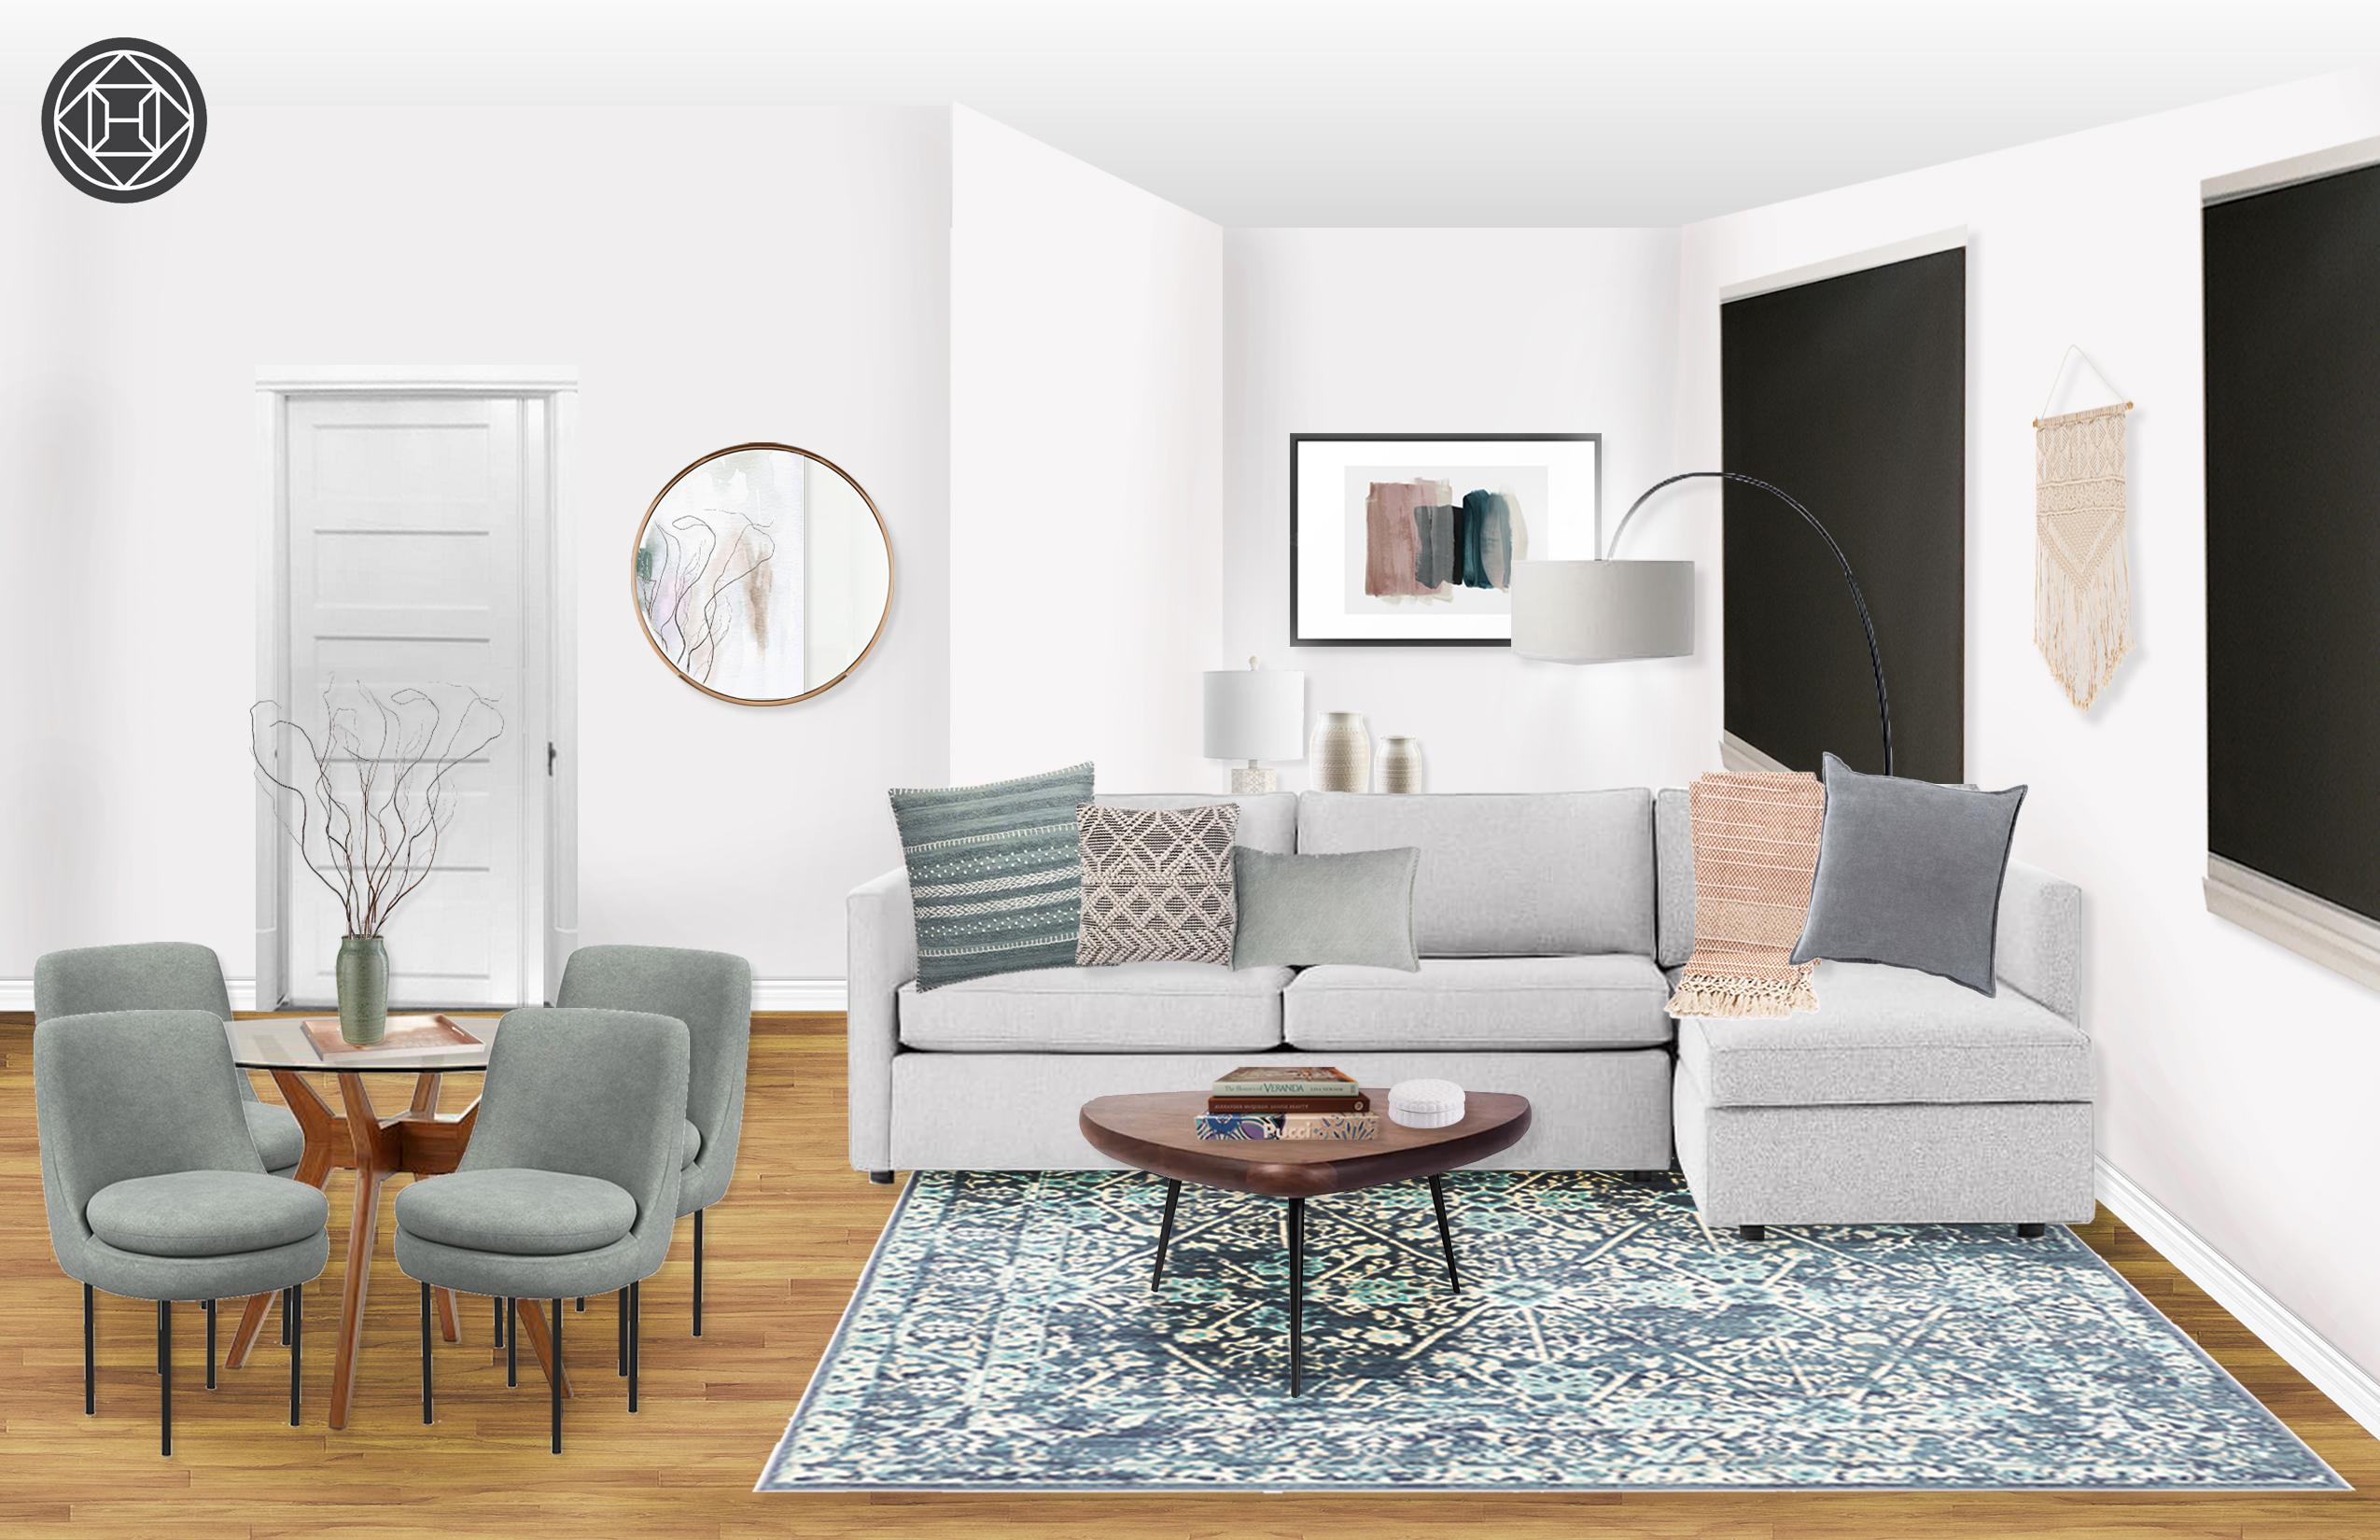 Eclectic Bohemian Industrial Minimal Living Room Design